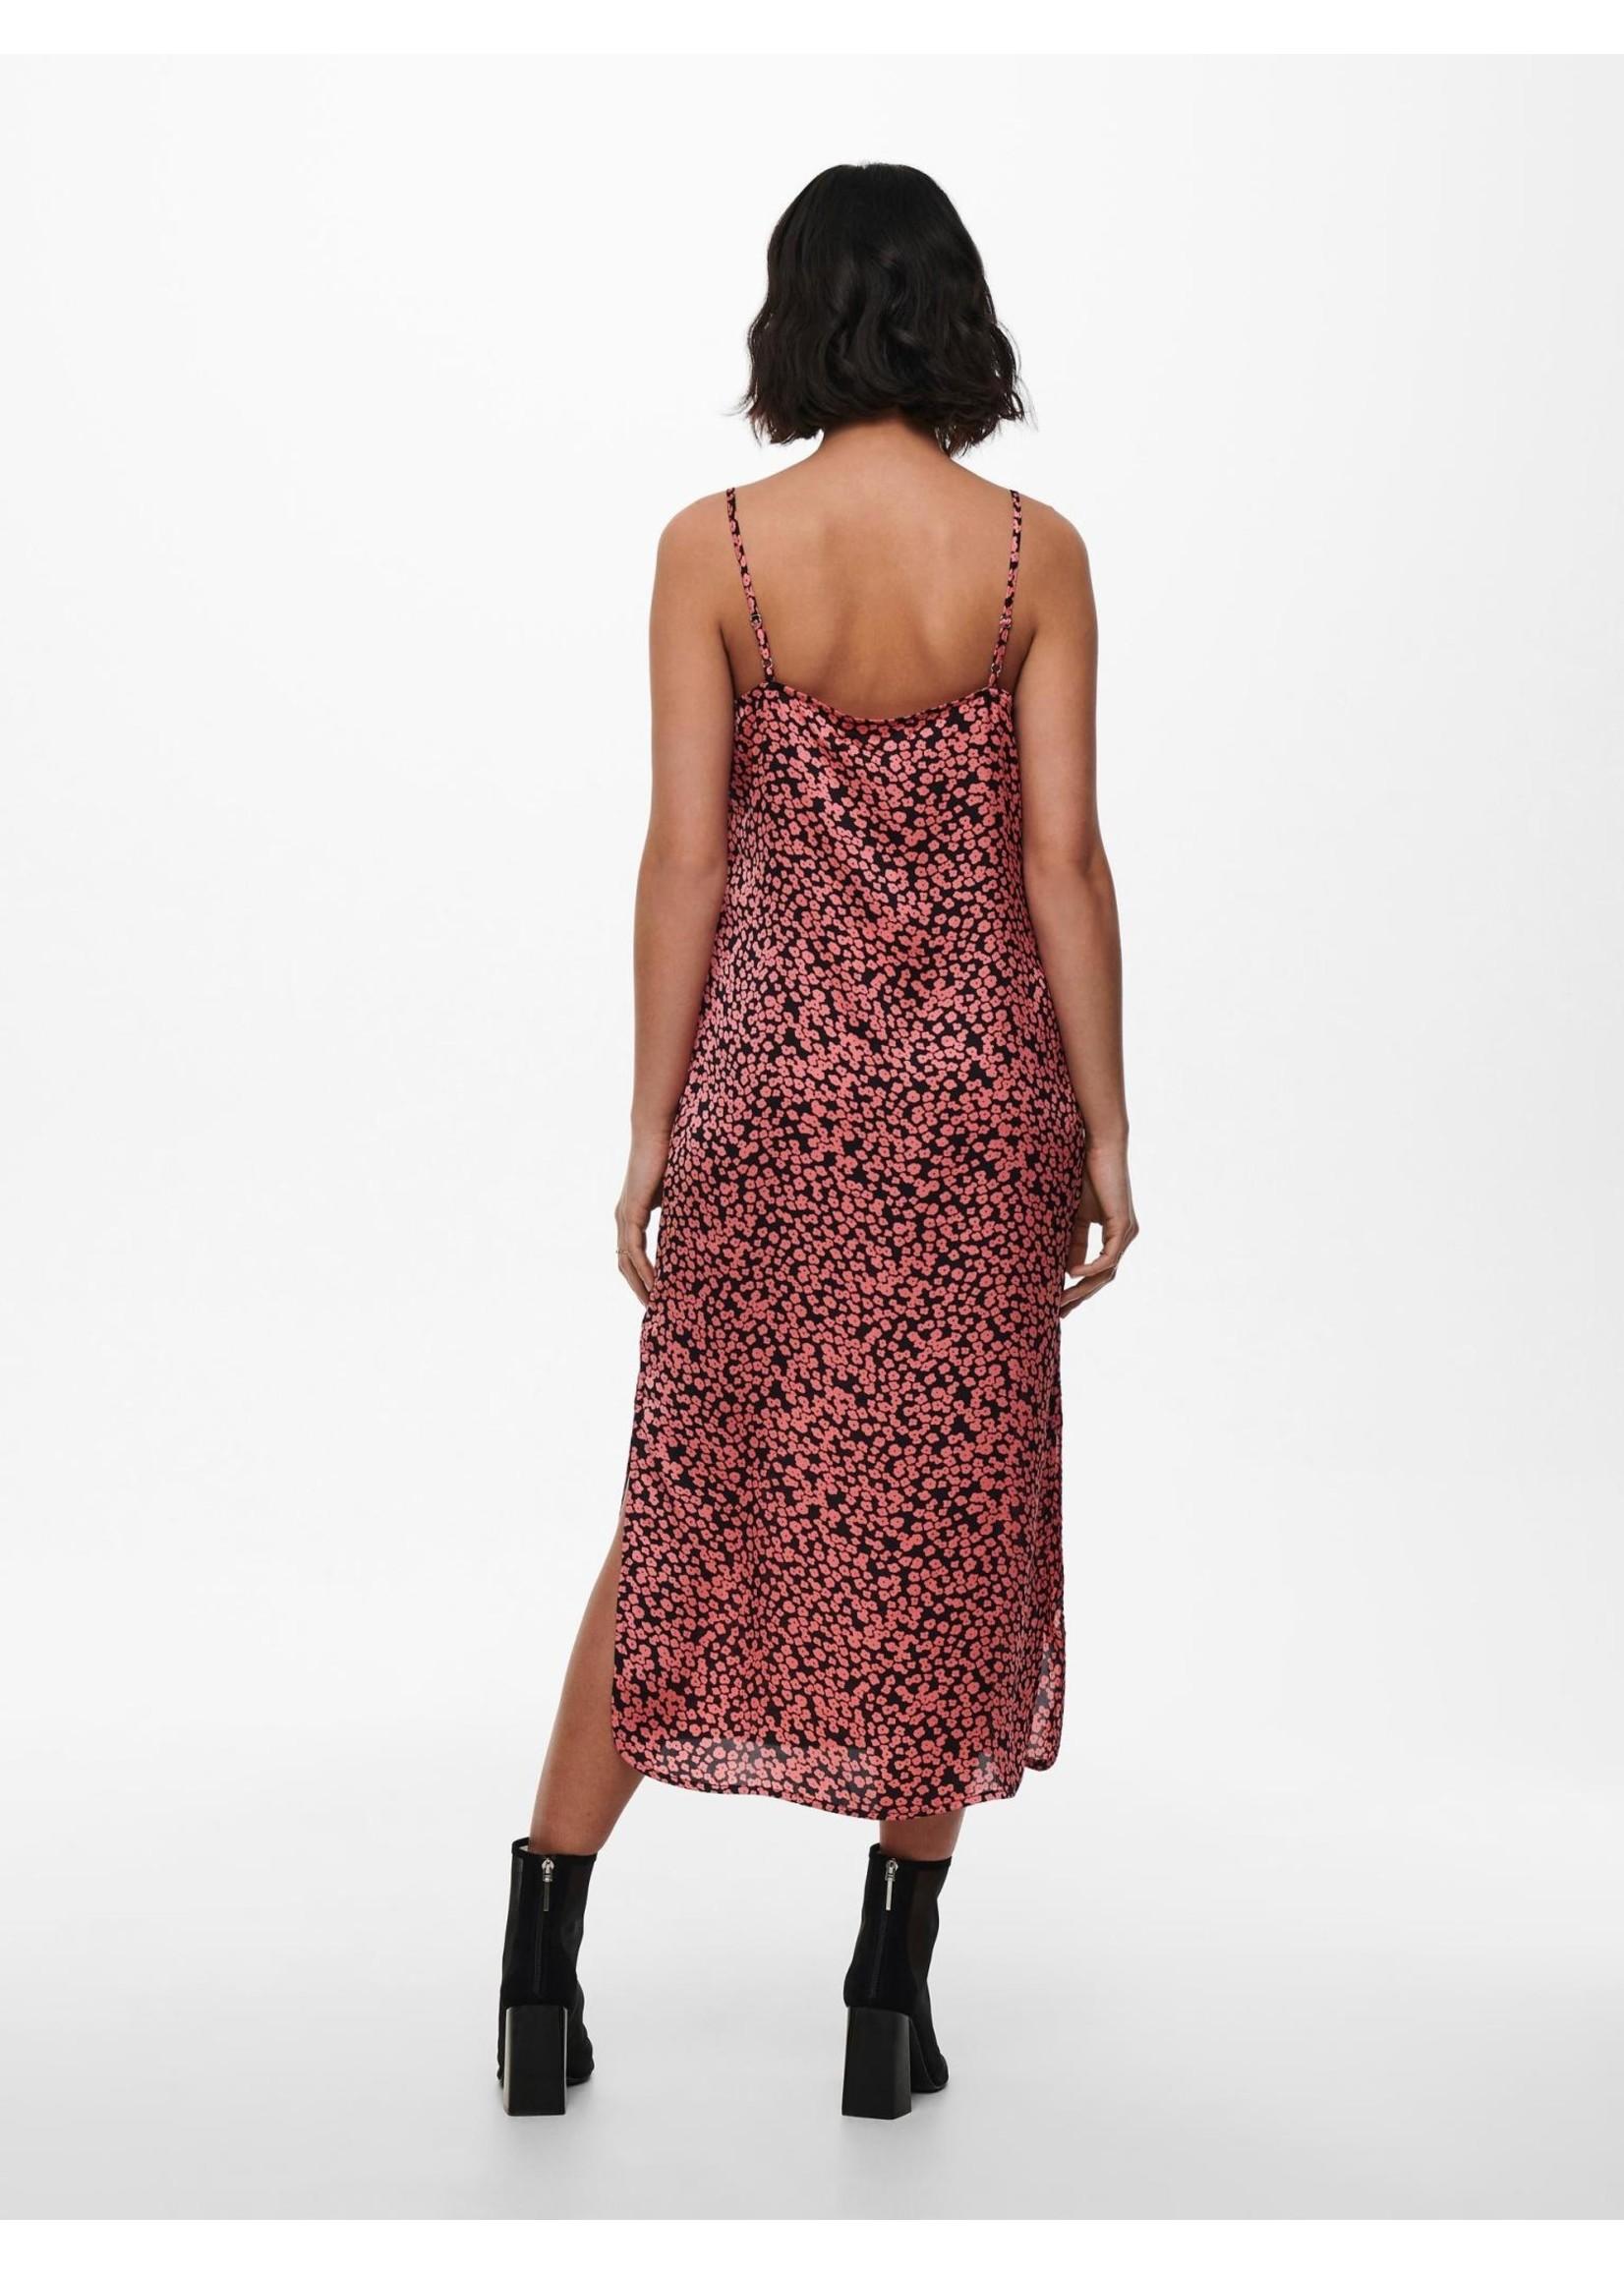 ONLY MAARIA LIFE SATEEN AOP SLIP DRESS TL Black strawberry pink aop